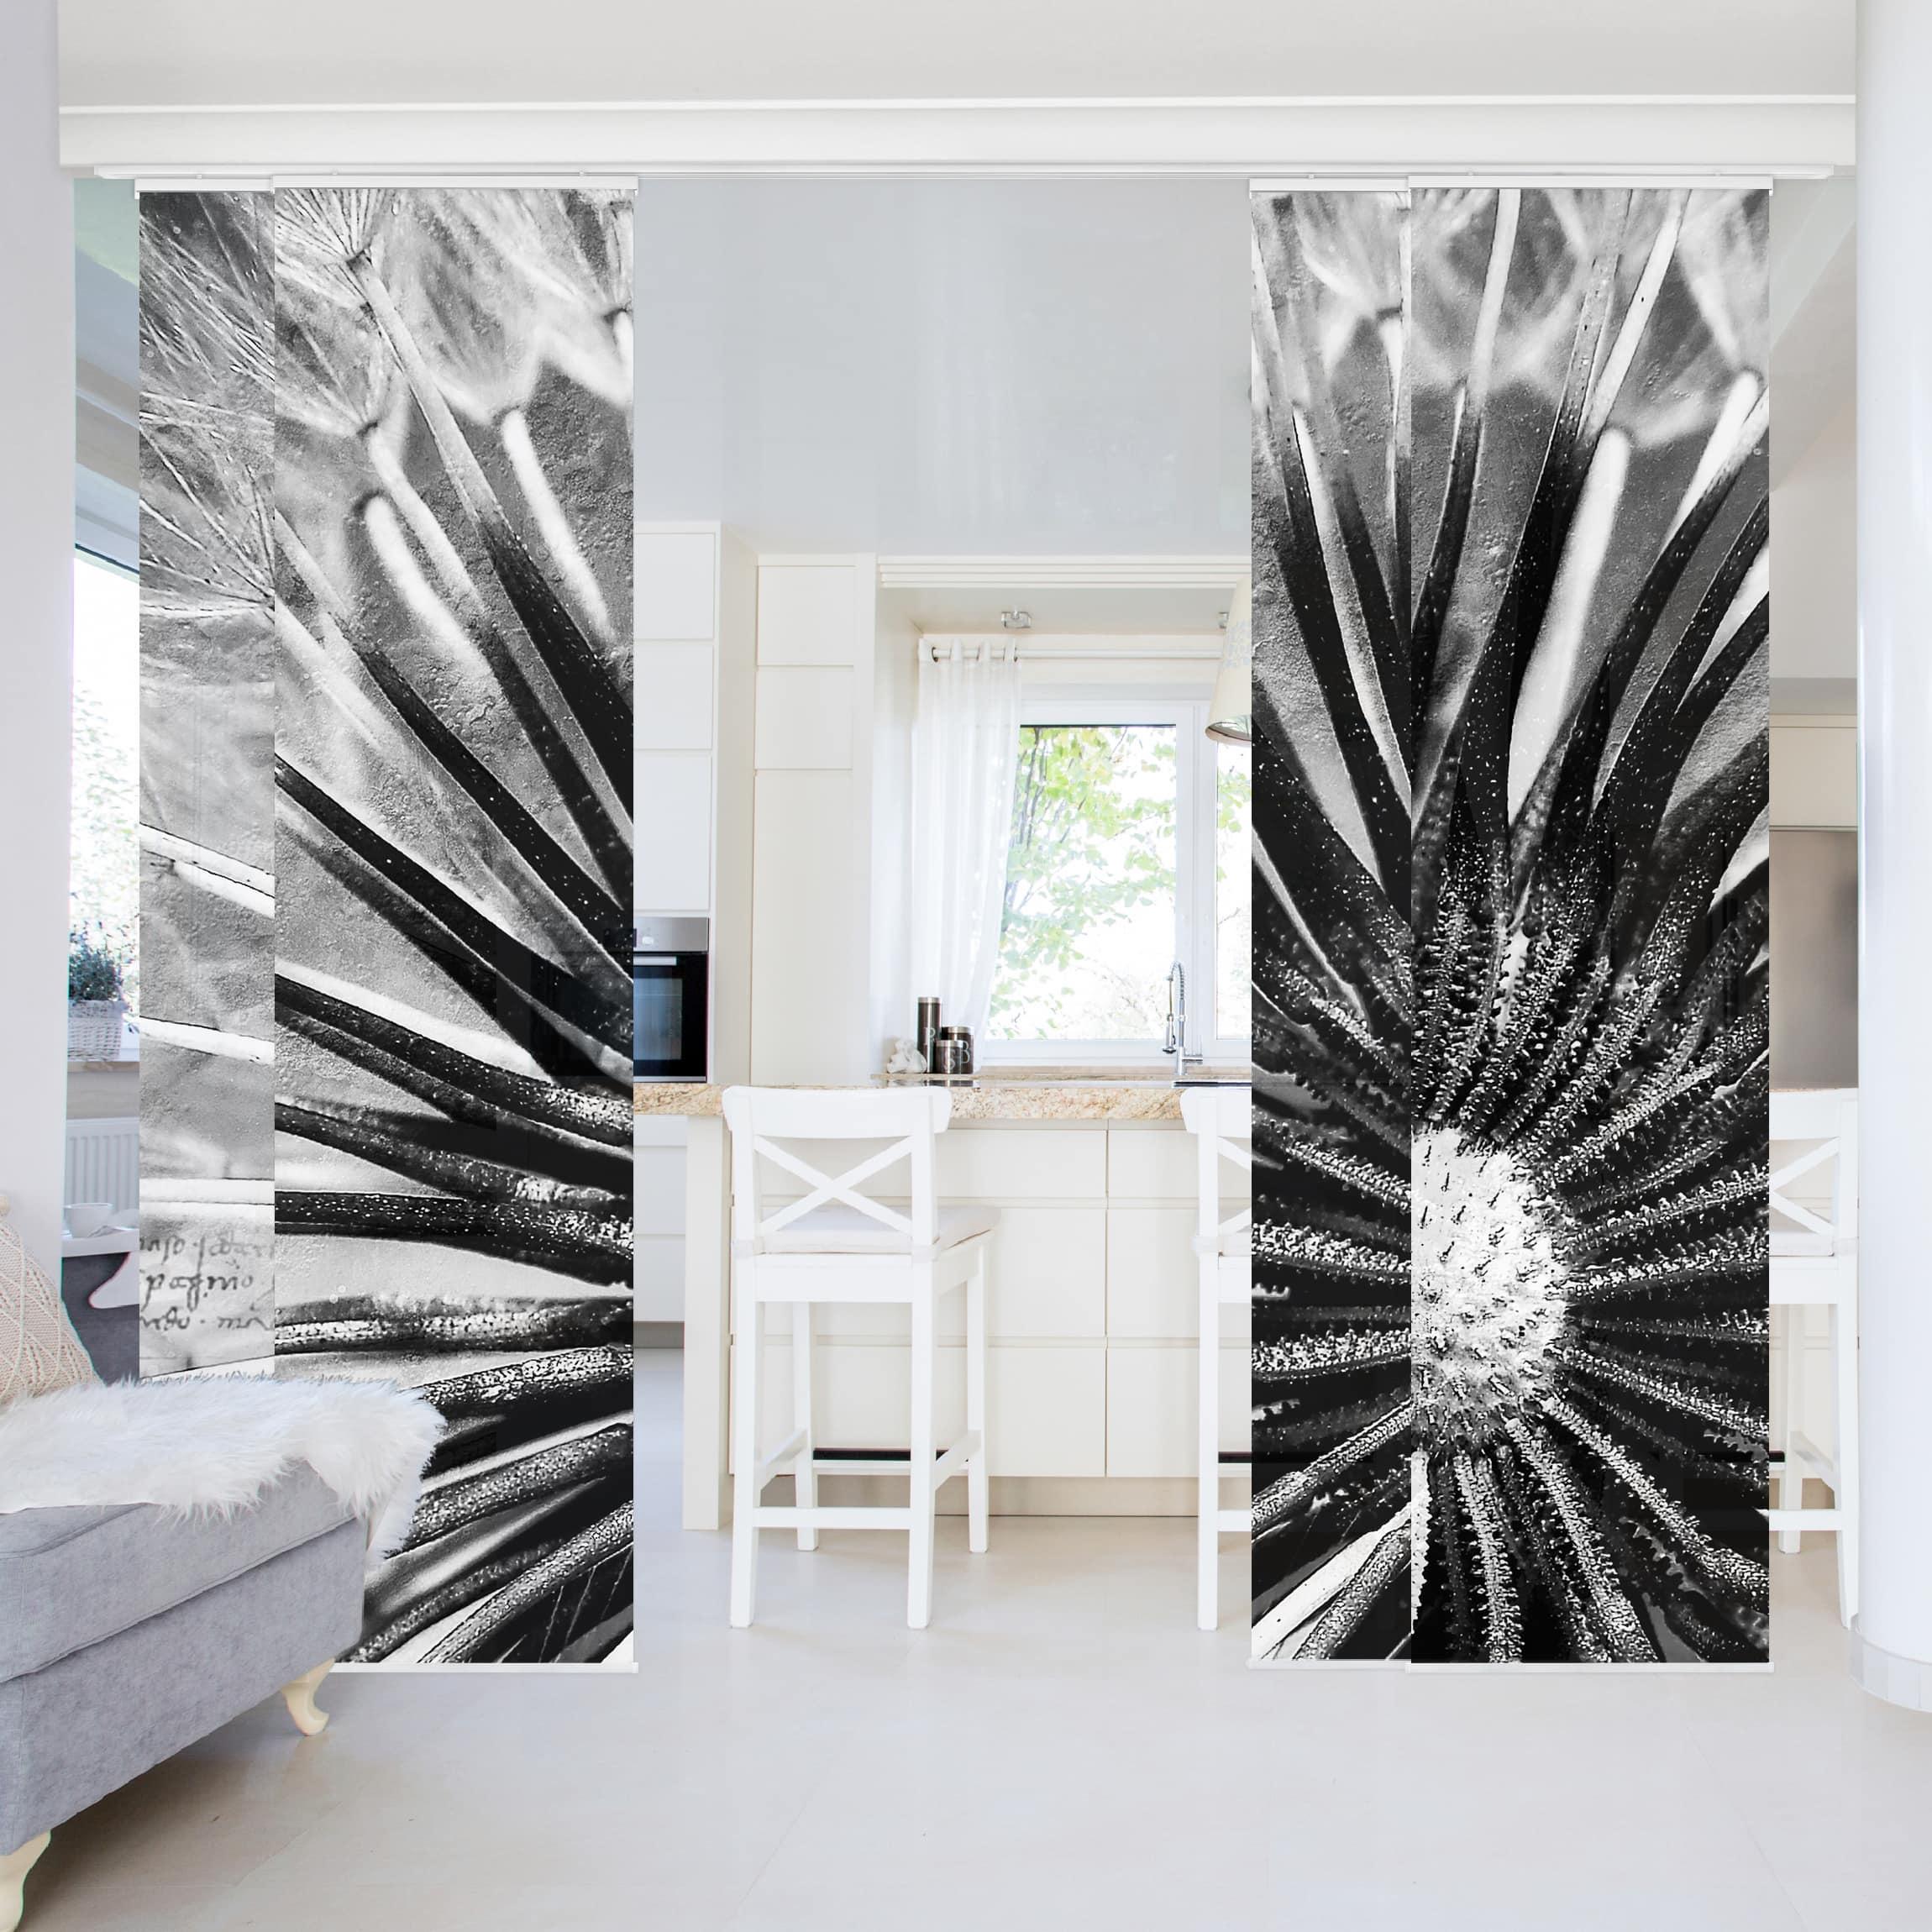 schiebegardinen set pusteblume schwarz wei 4. Black Bedroom Furniture Sets. Home Design Ideas